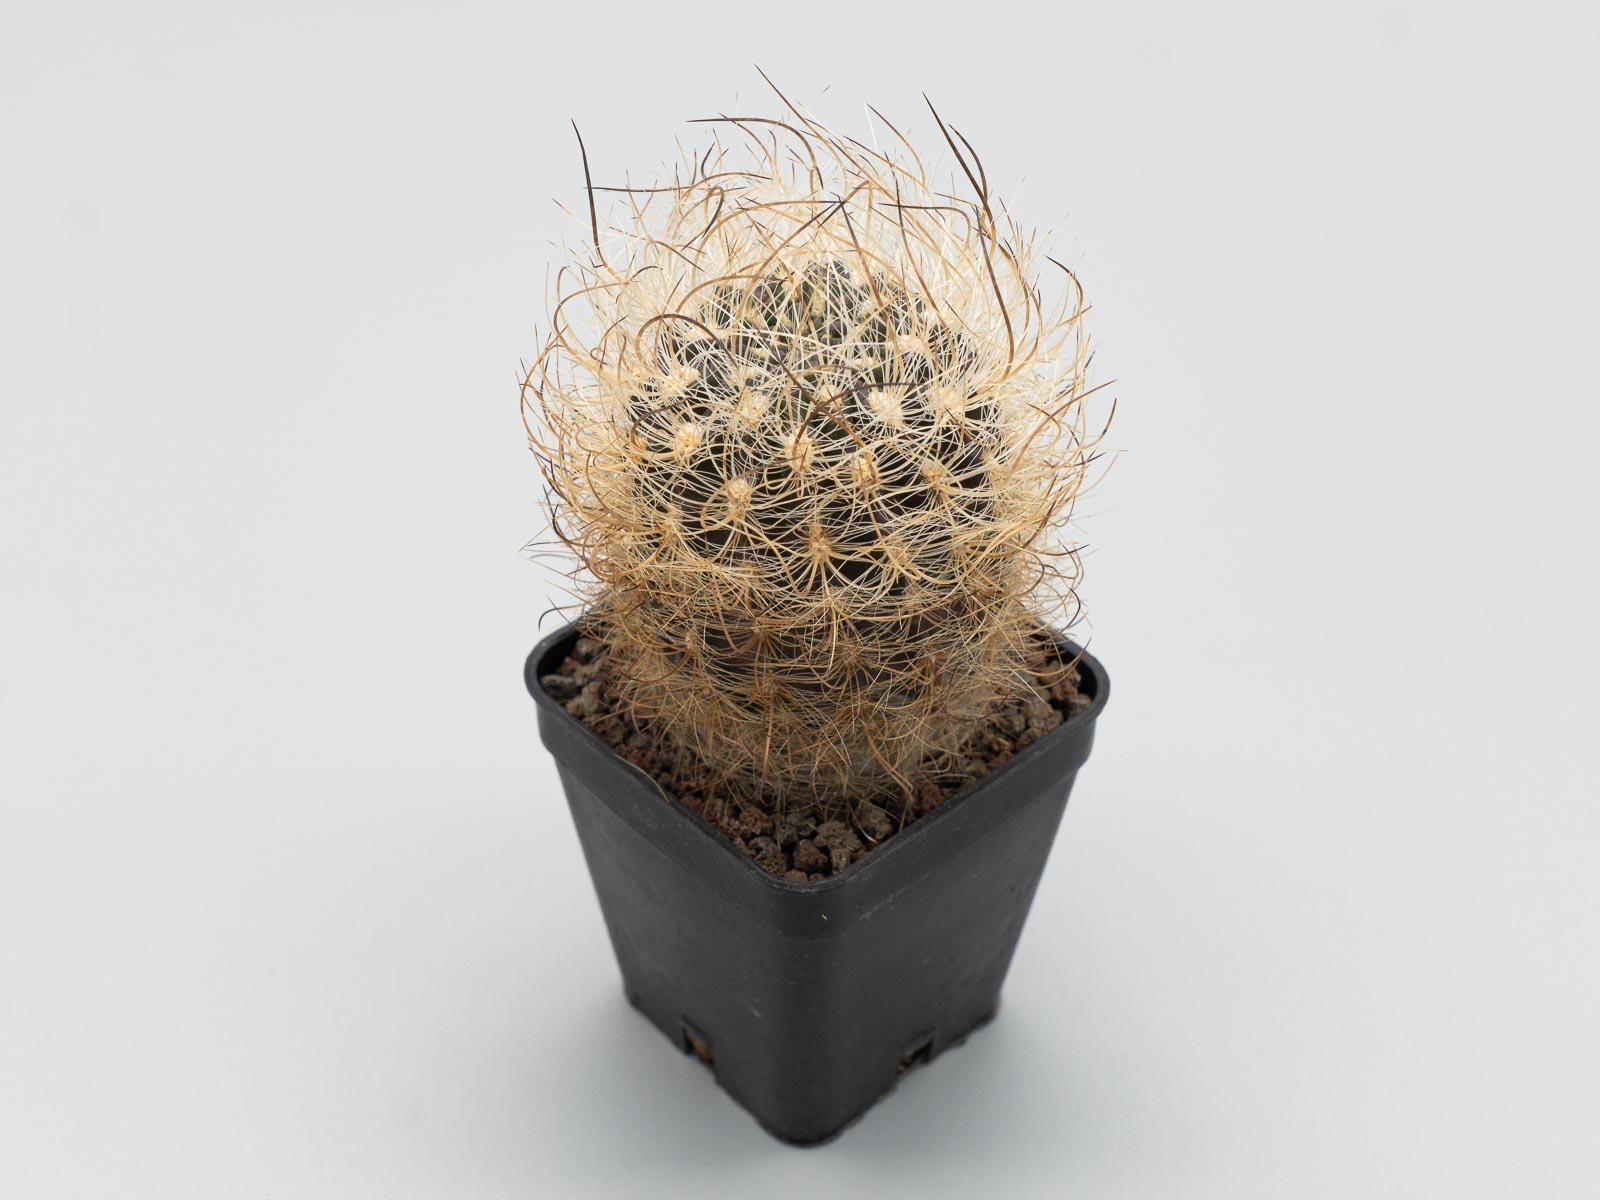 Eriosyce senilis (Neoporteria)